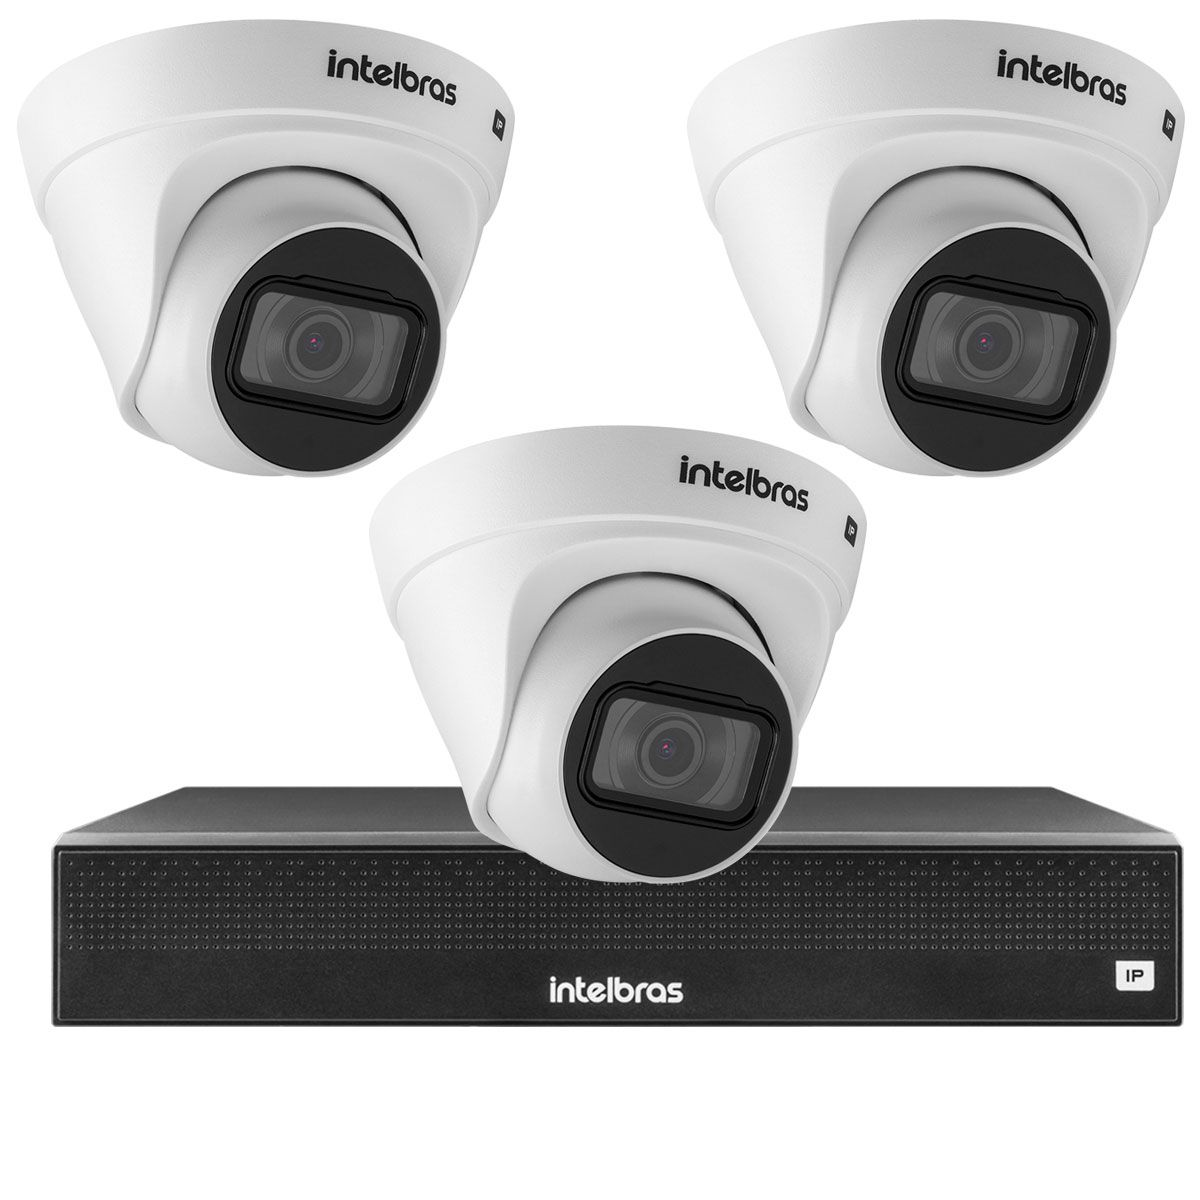 kit-3-cameras-vip-1020-d-g2-nvr-intelbras-app-gratis-de-monitoramento-cameras-hd-720p-20m-infravermelho-de-visao-noturna-intelbras